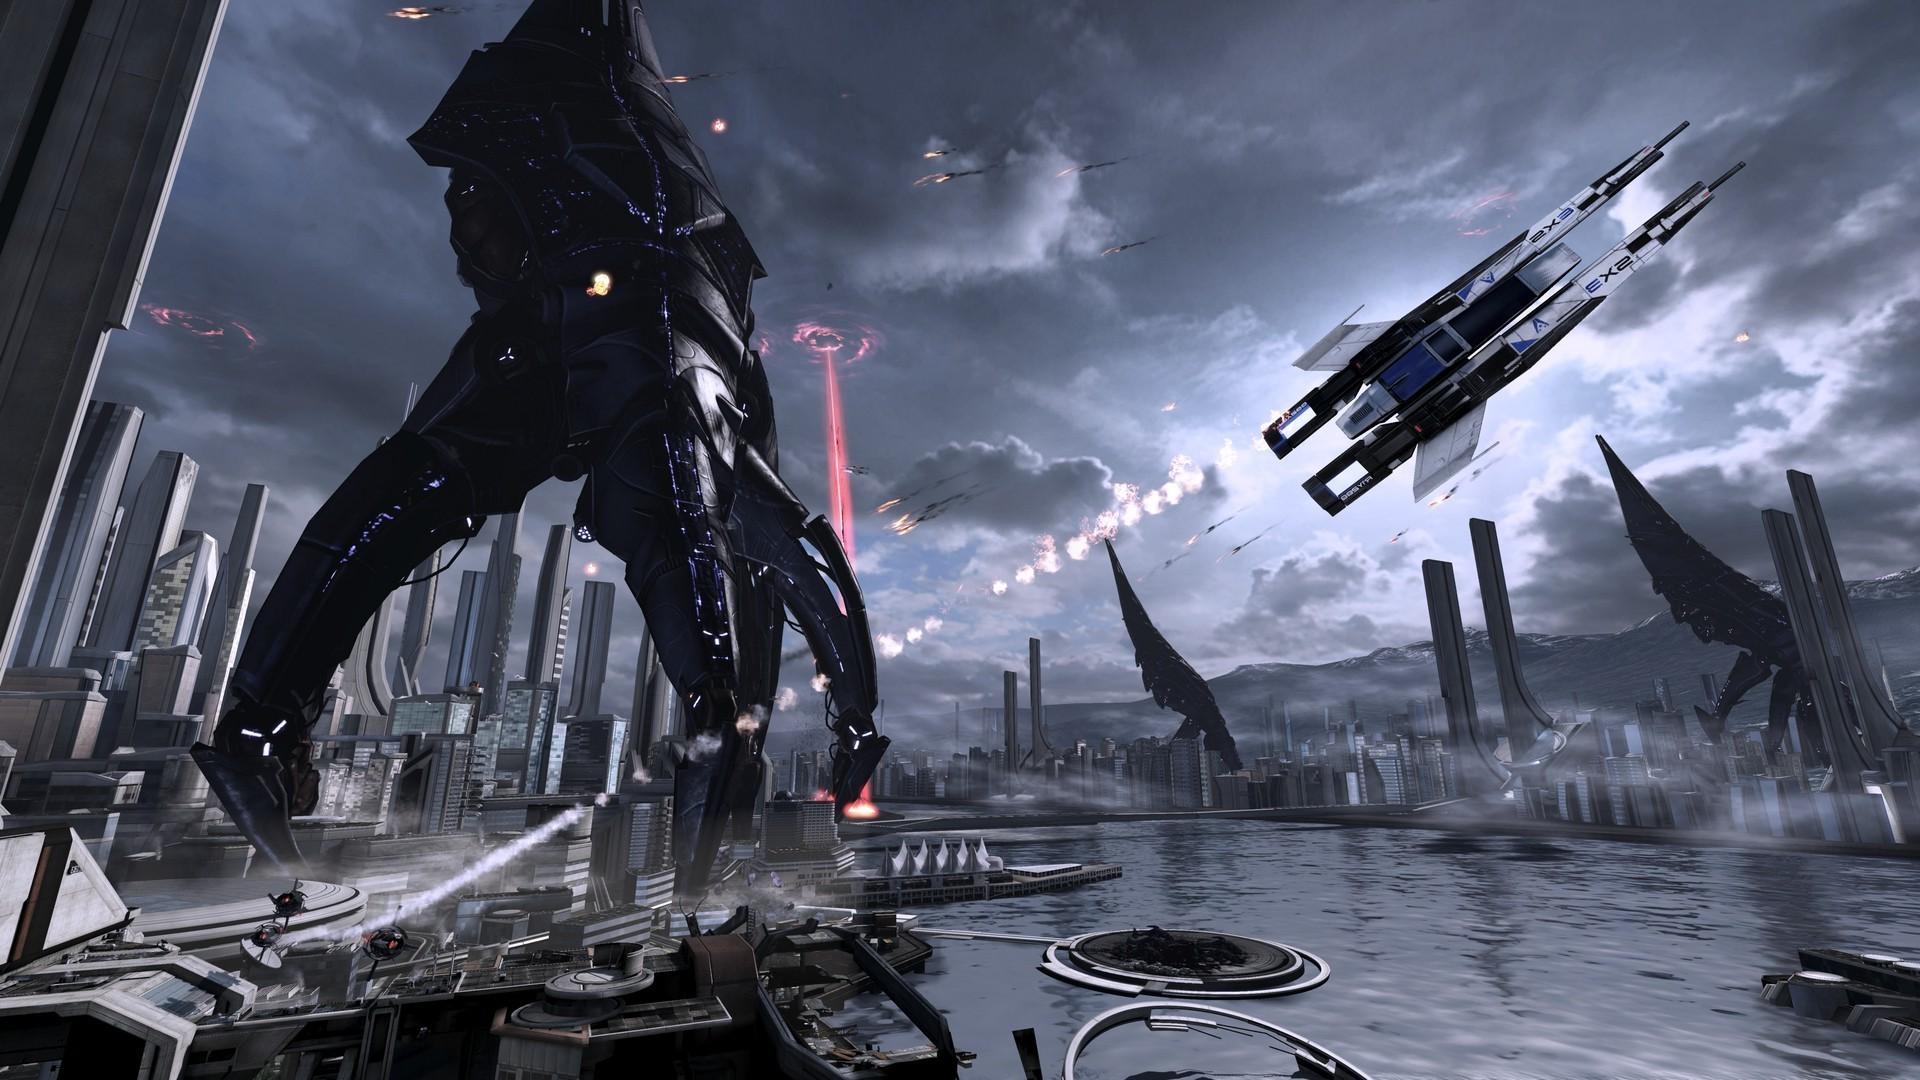 Mass Effect Mass Effect 2 Mass Effect 3 Reapers Mass Effect Background Reaper 1787728 Hd Wallpaper Backgrounds Download